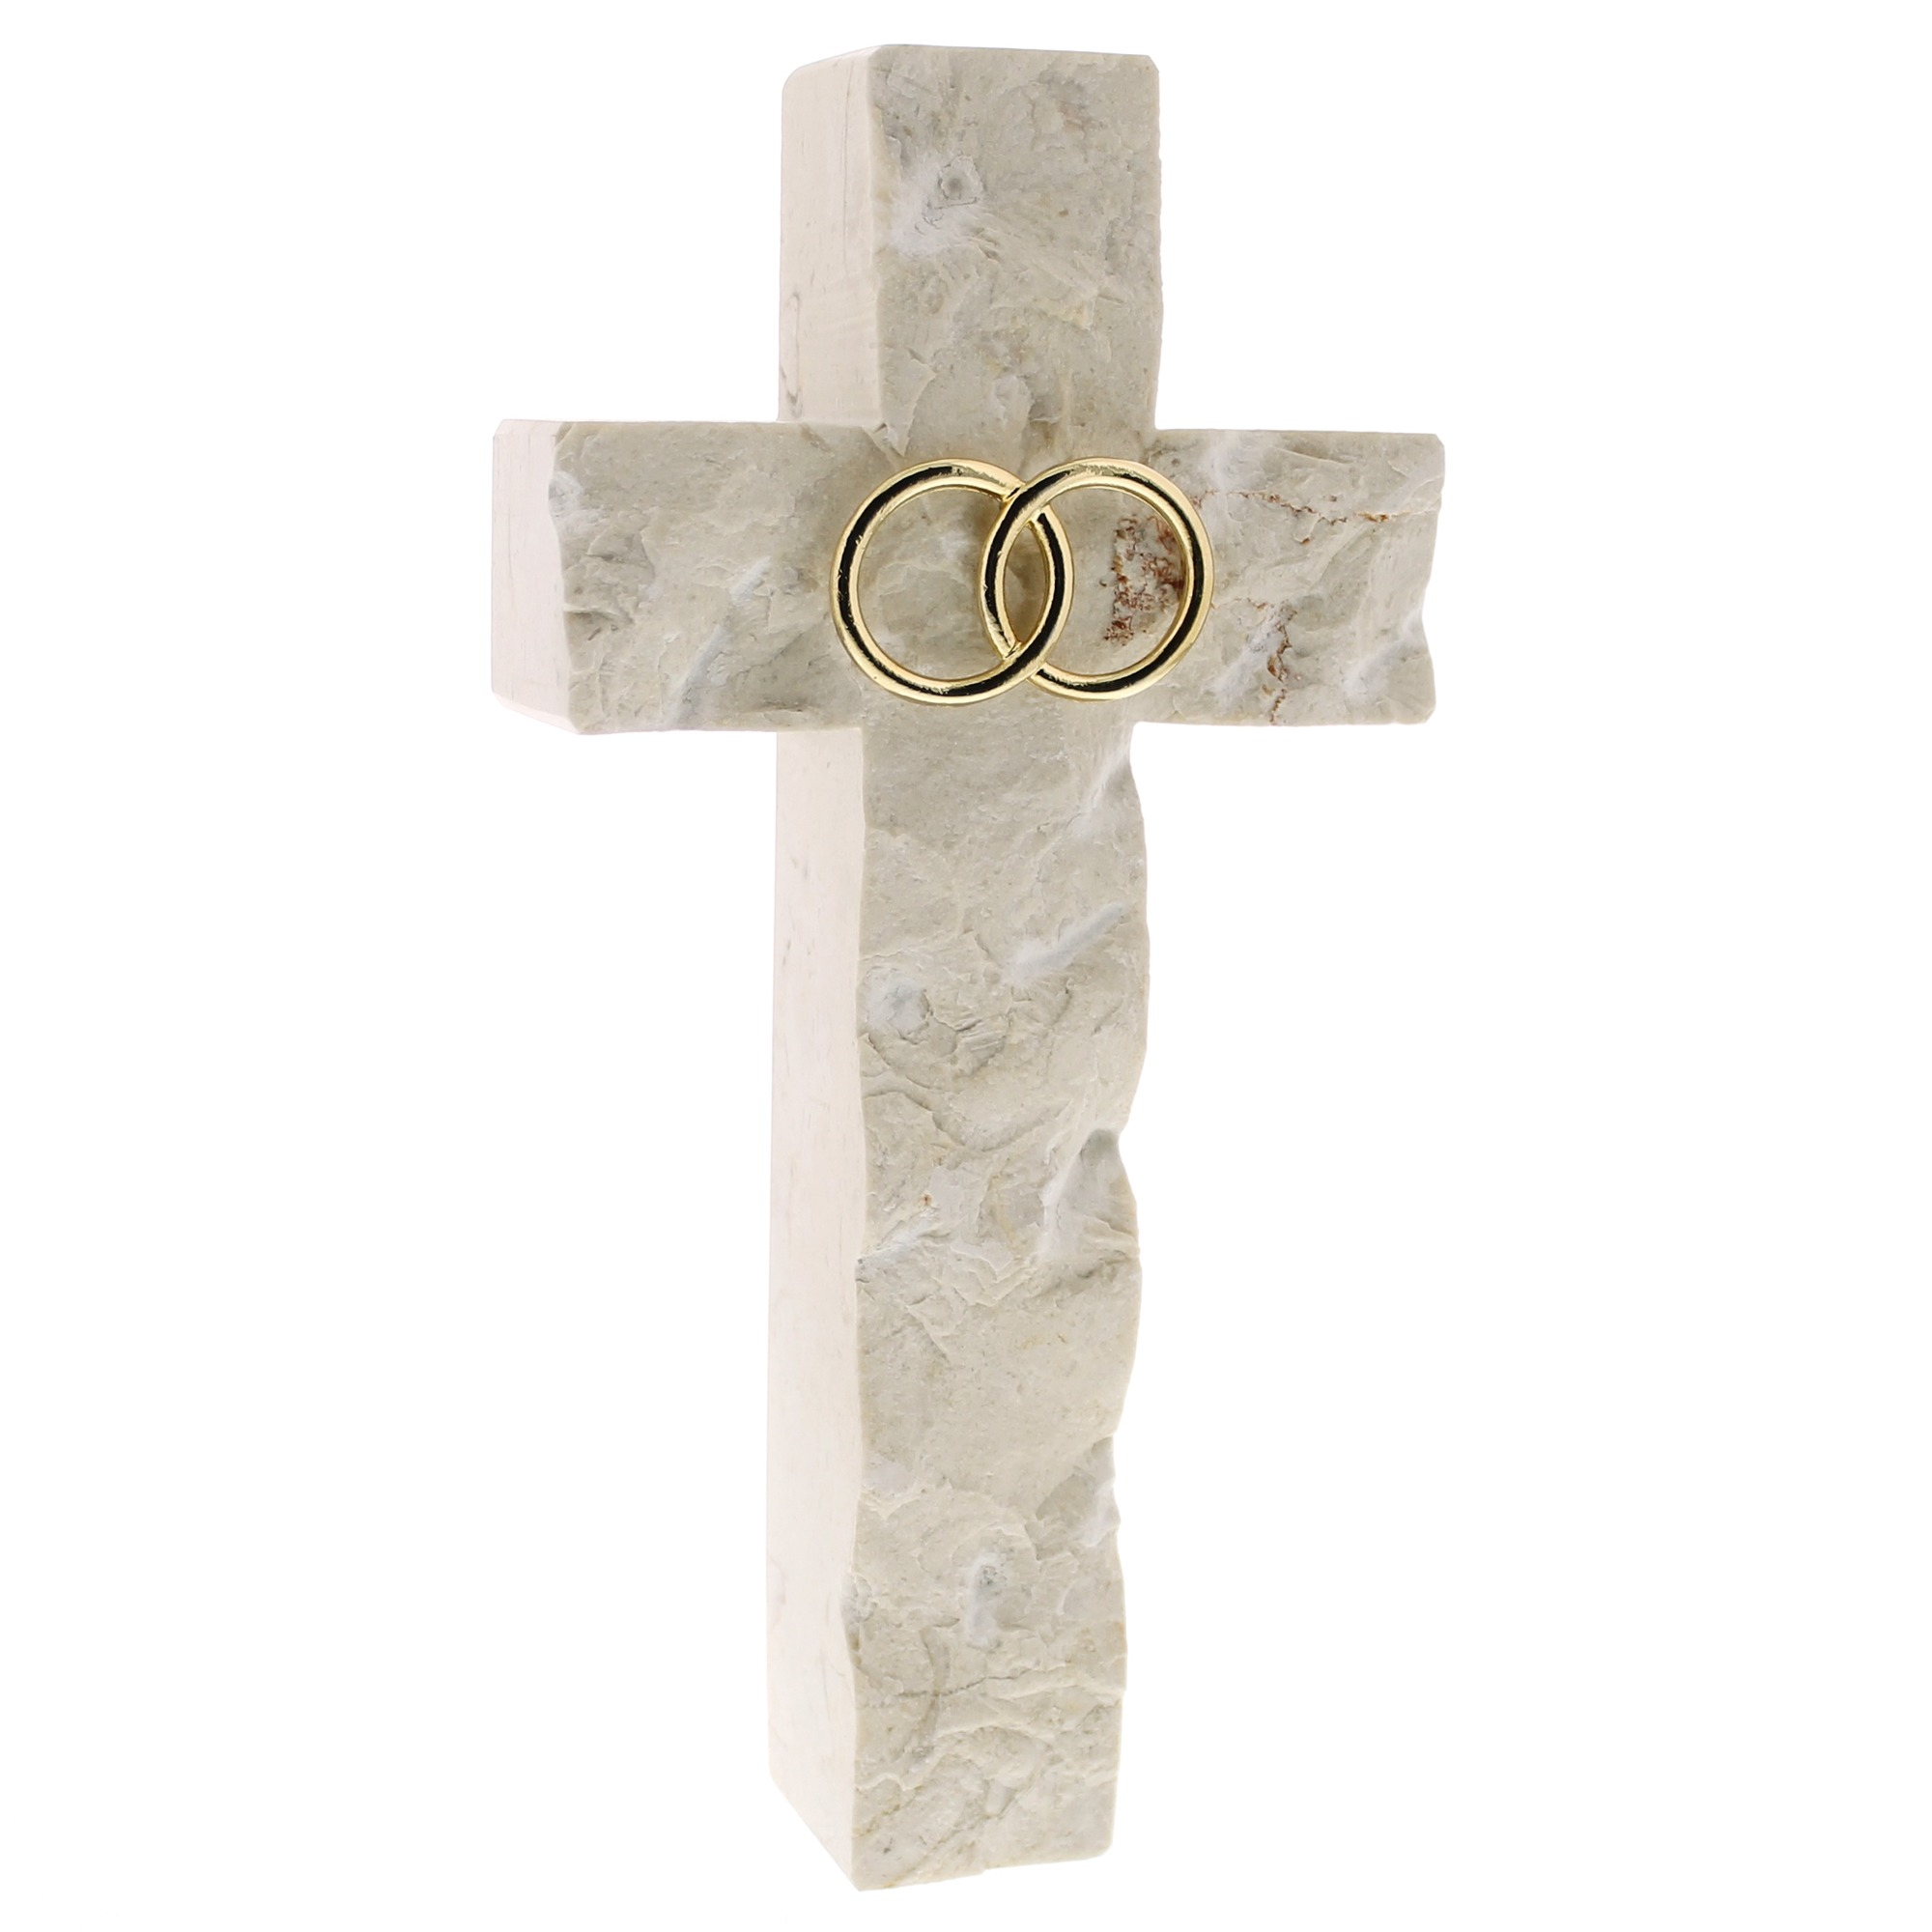 50th anniversary gold cross